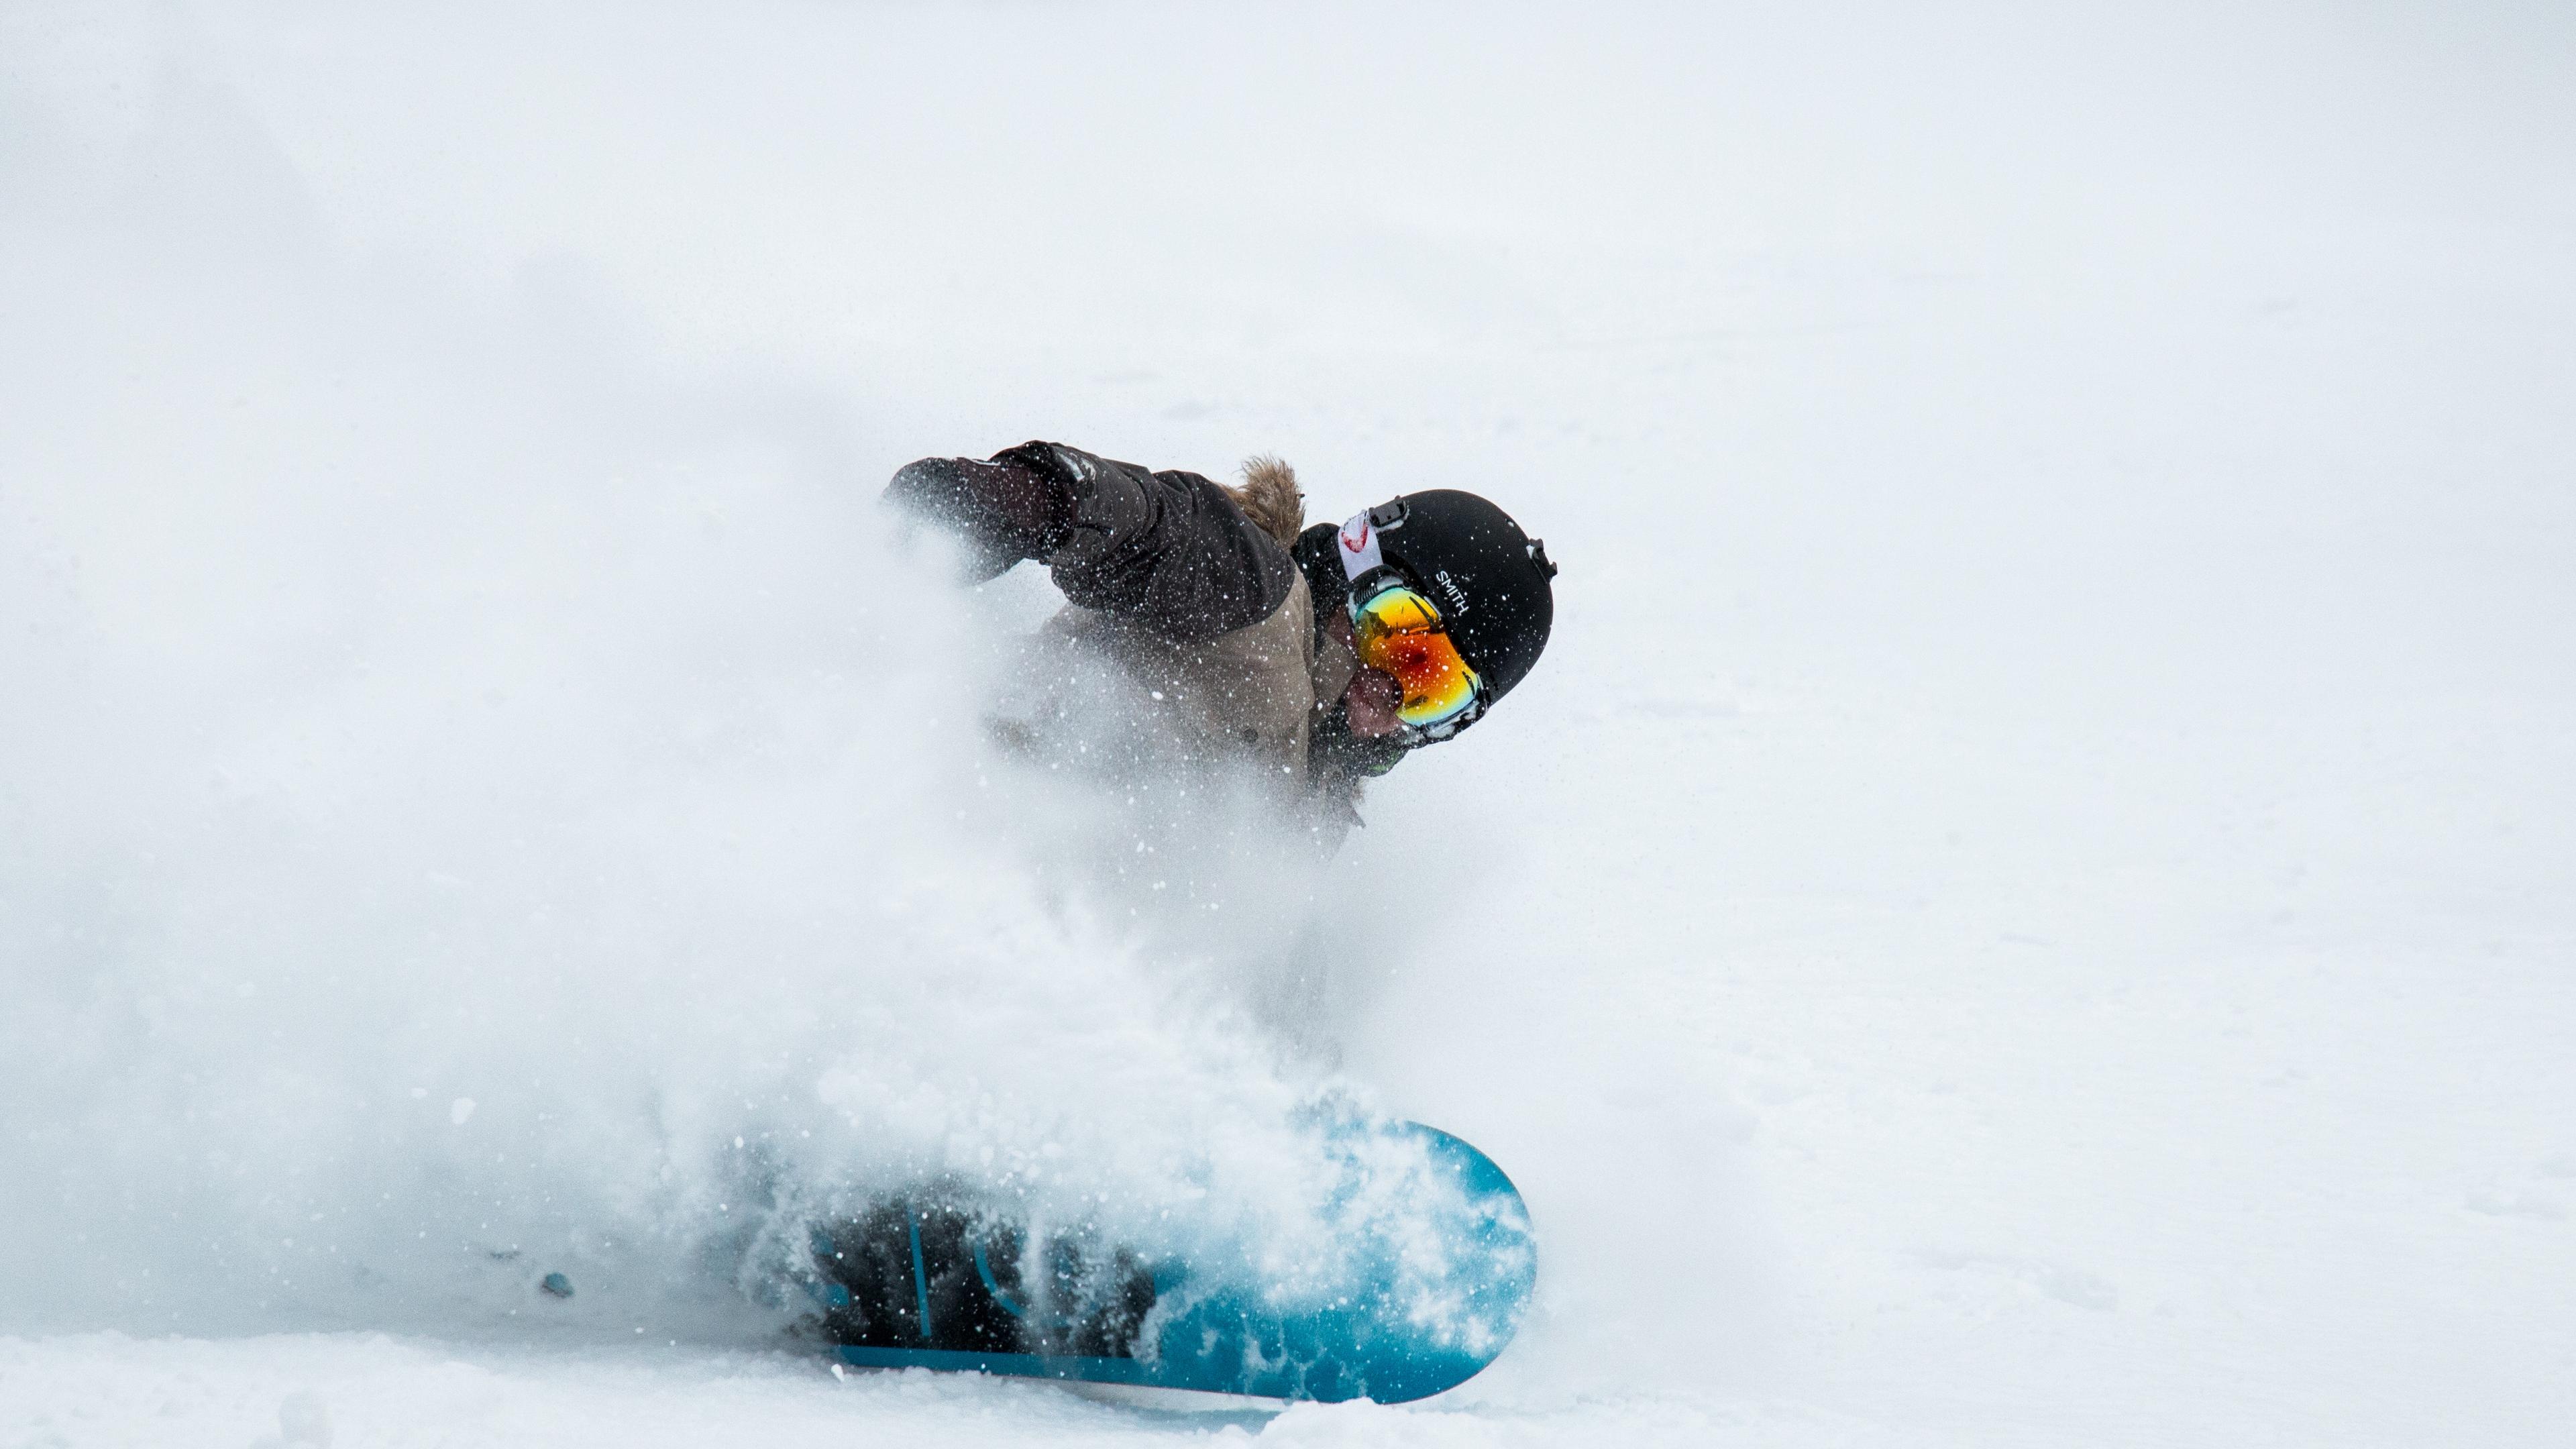 snowboarder snow helmet glasses 4k 1540061543 - snowboarder, snow, helmet, glasses 4k - snowboarder, Snow, helmet